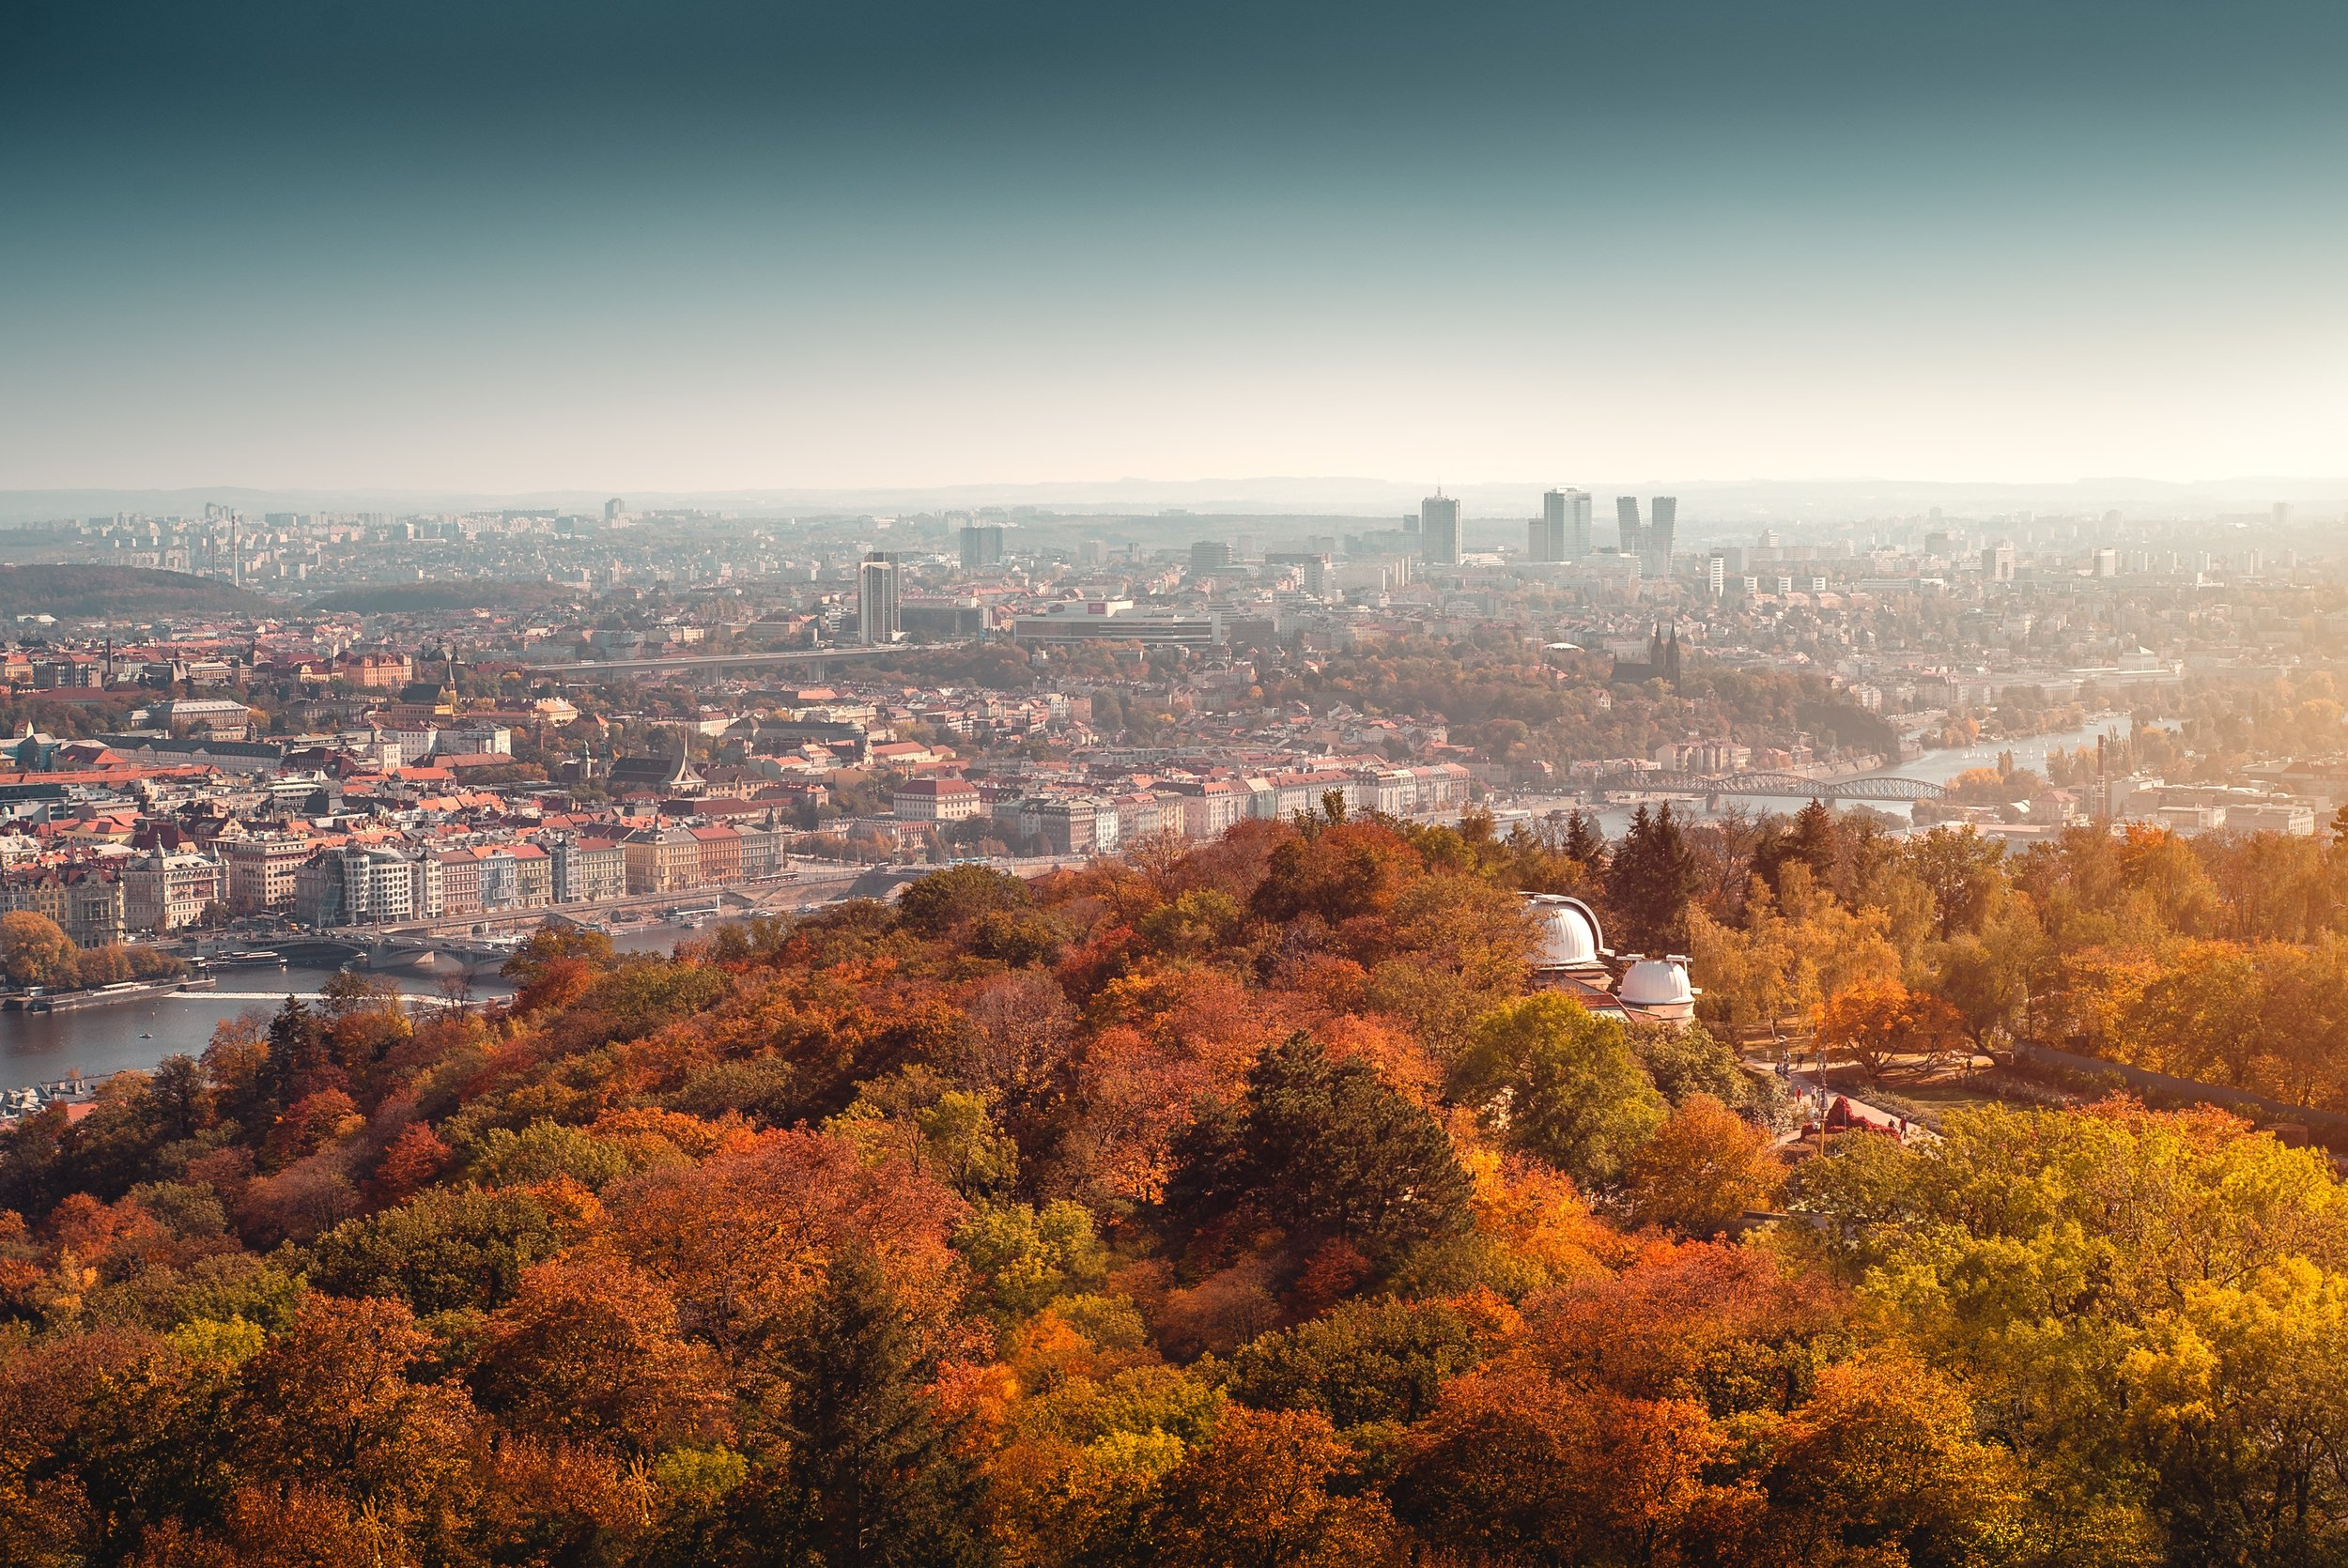 View from Petrin Tower, Czech Republic